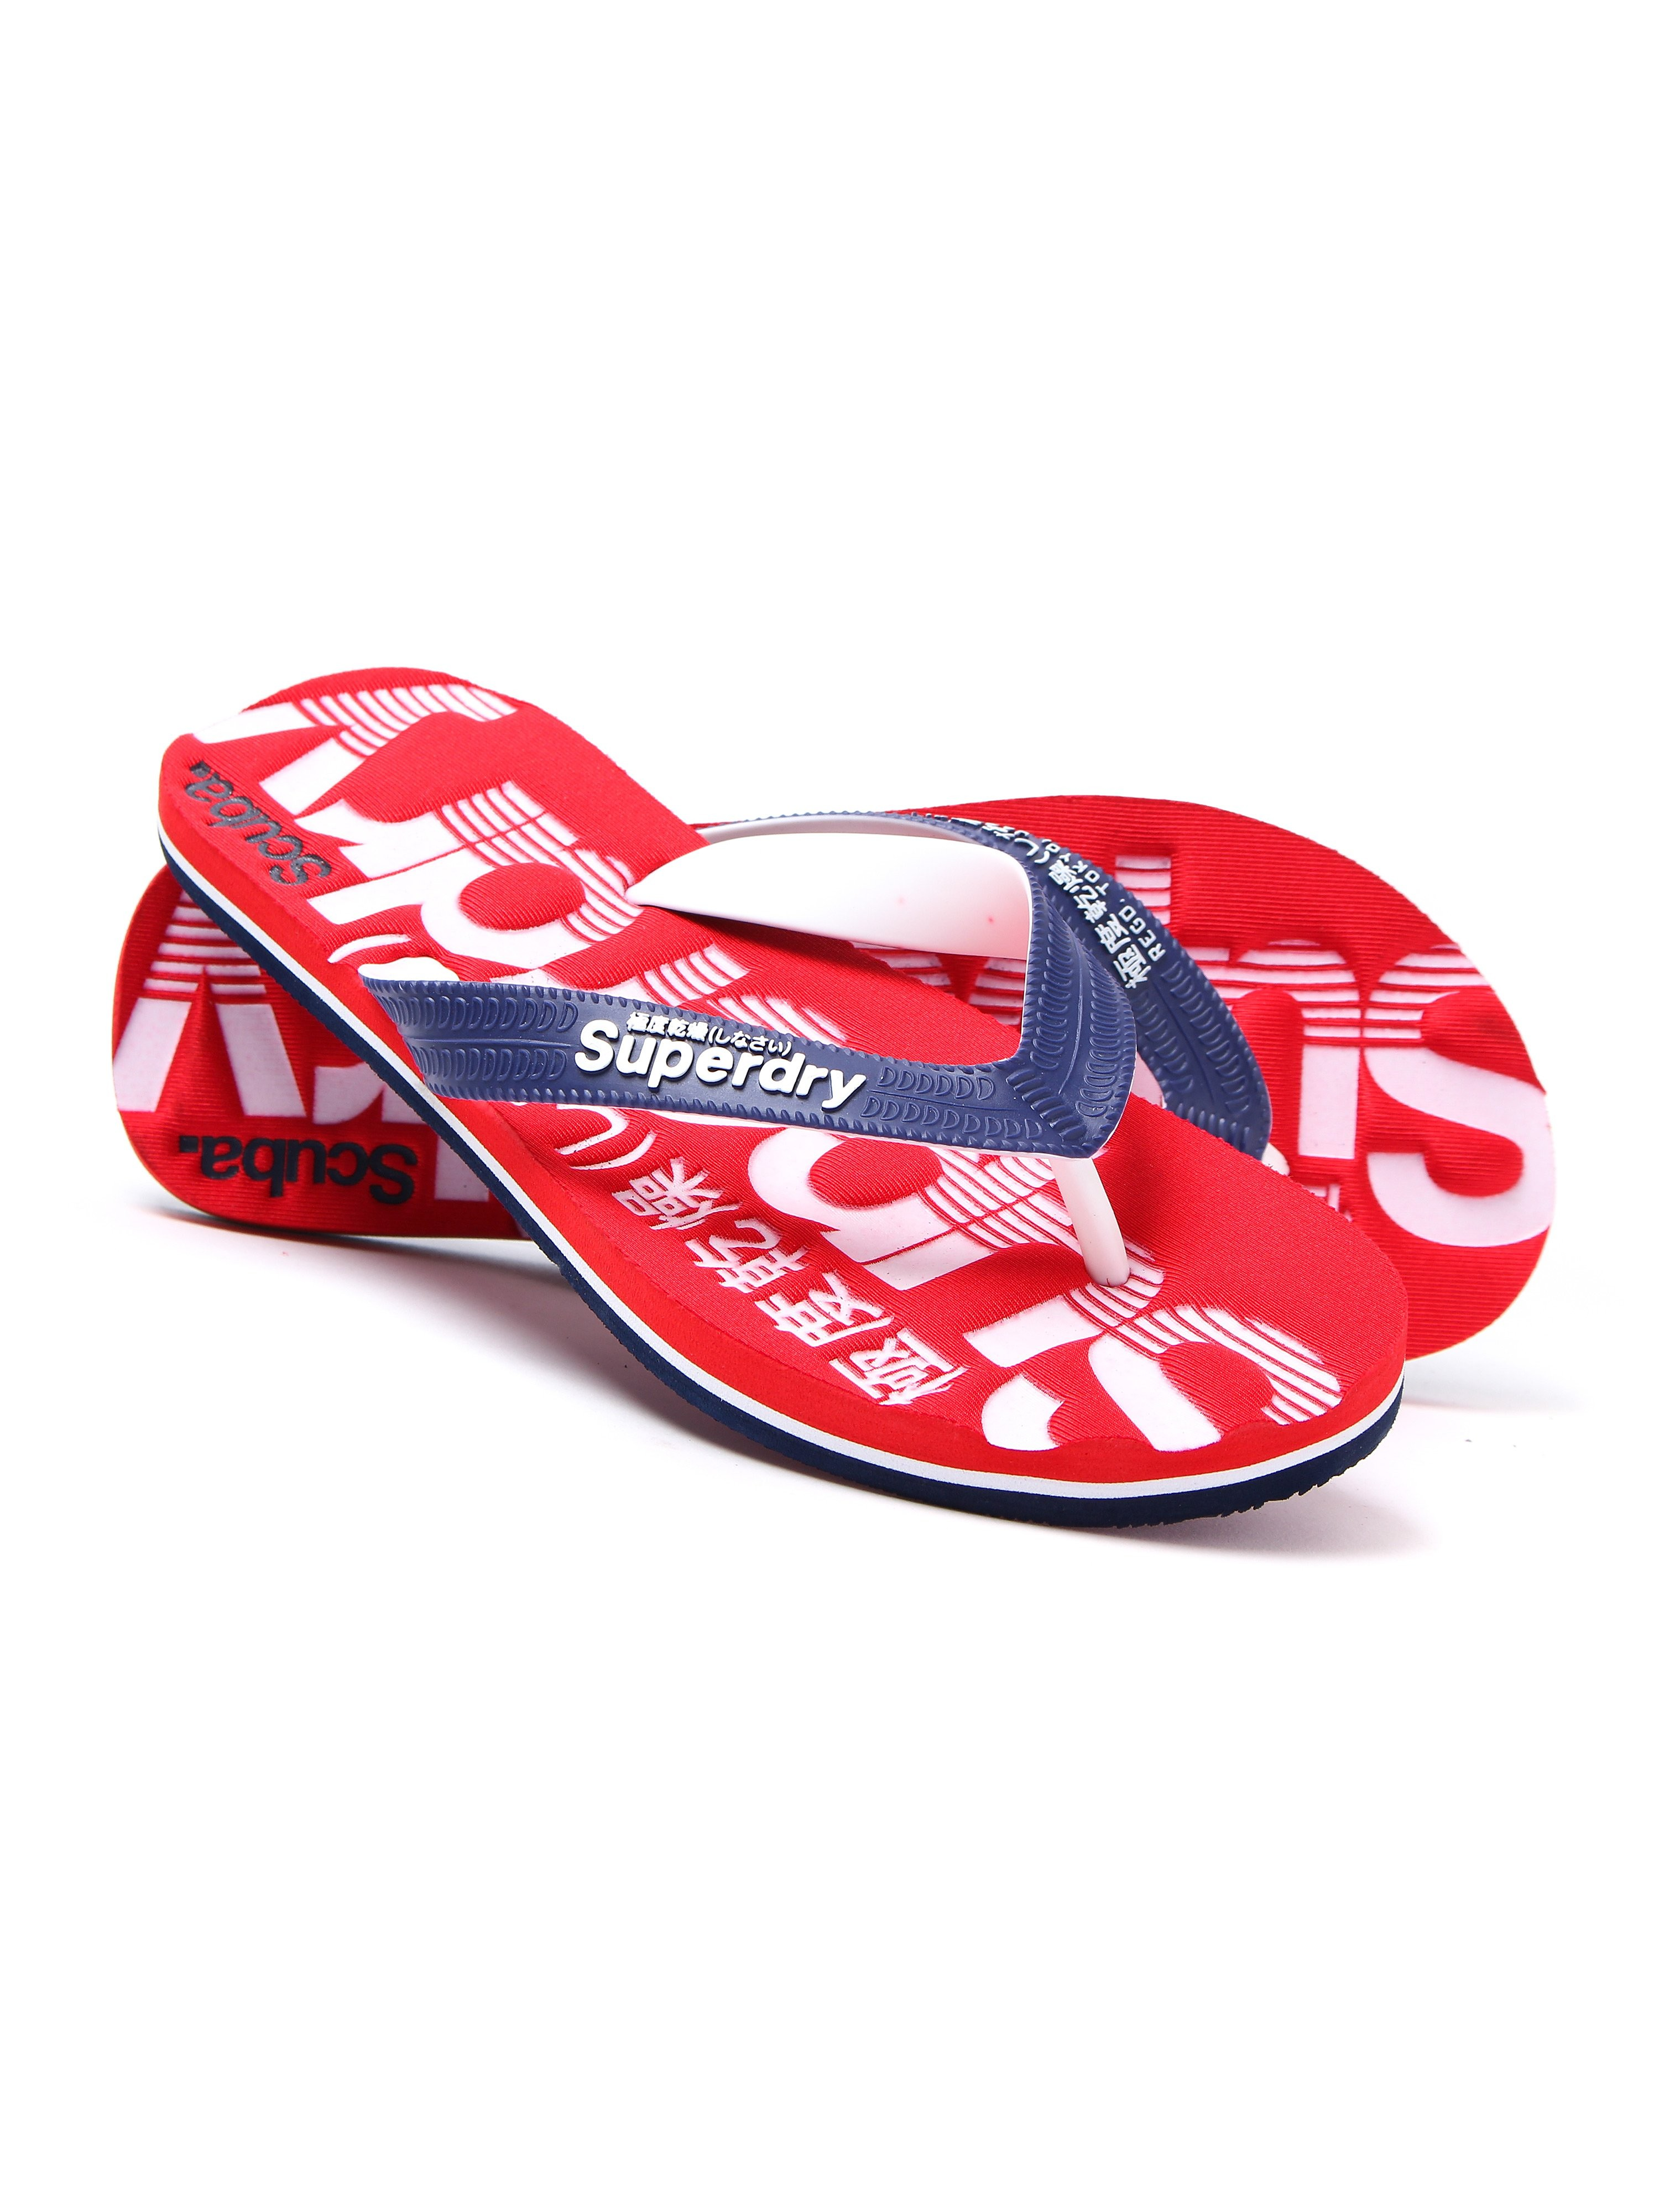 Superdry Men's Scuba Lightweight Flip Flops - Red & Navy